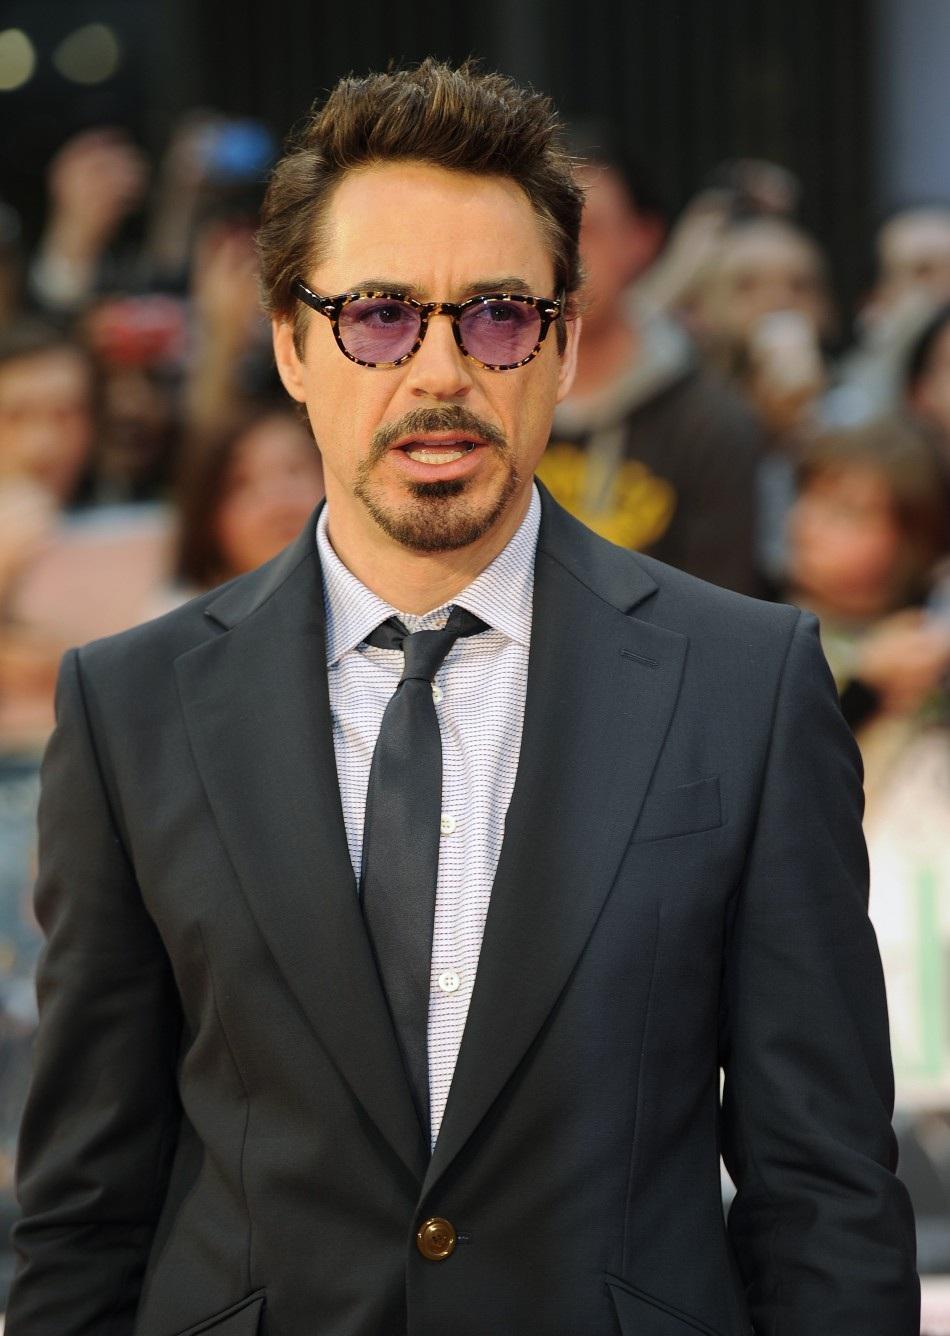 Johhny Depp is wearing Oliver Peoples Sheldrake OV 5036 700-4270 3fd56fbef149